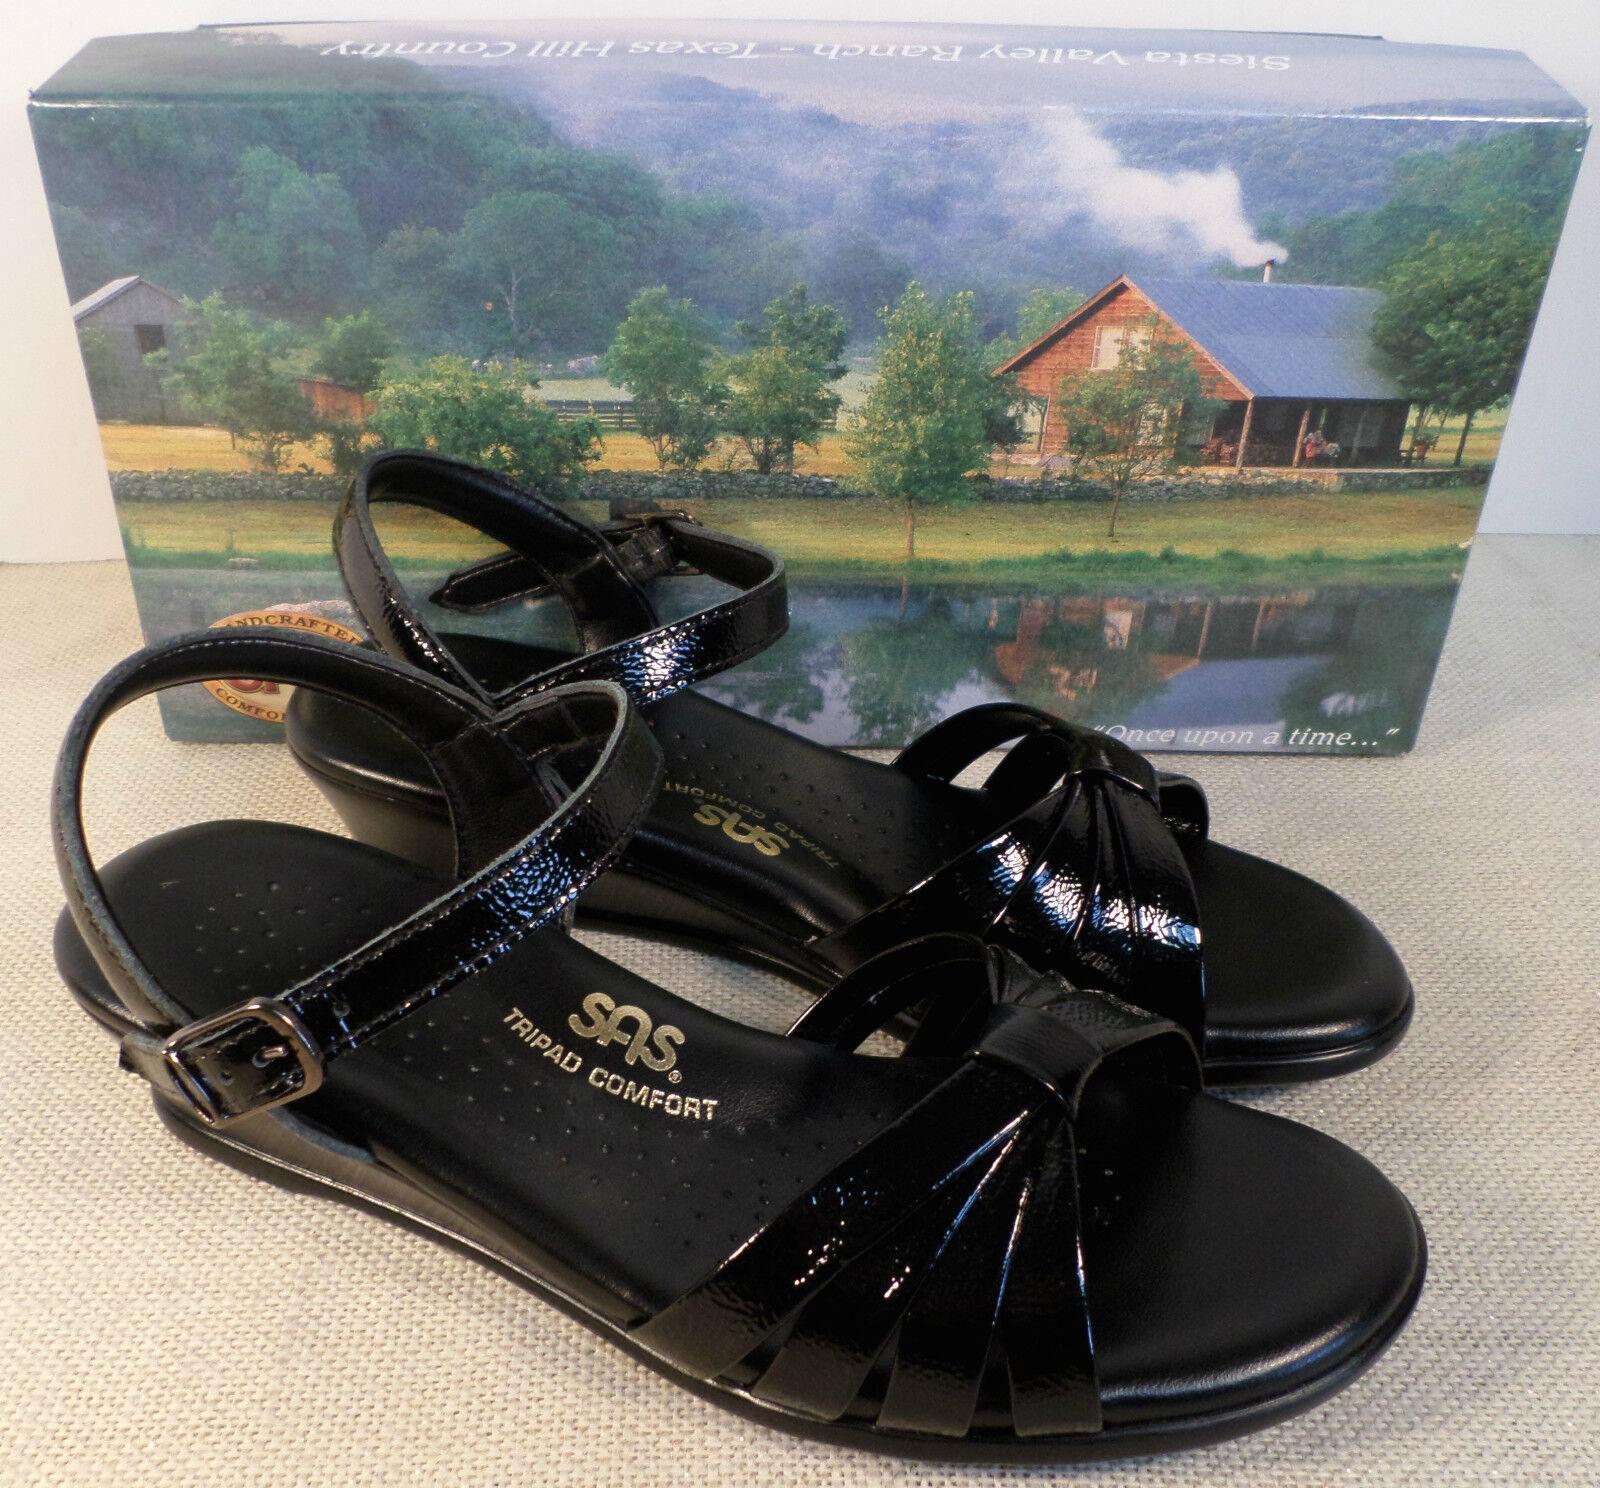 SAS STRIPPY WOMEN'S BLACK PATENT LEATHER DRESS SANDALS NEW IN BOX